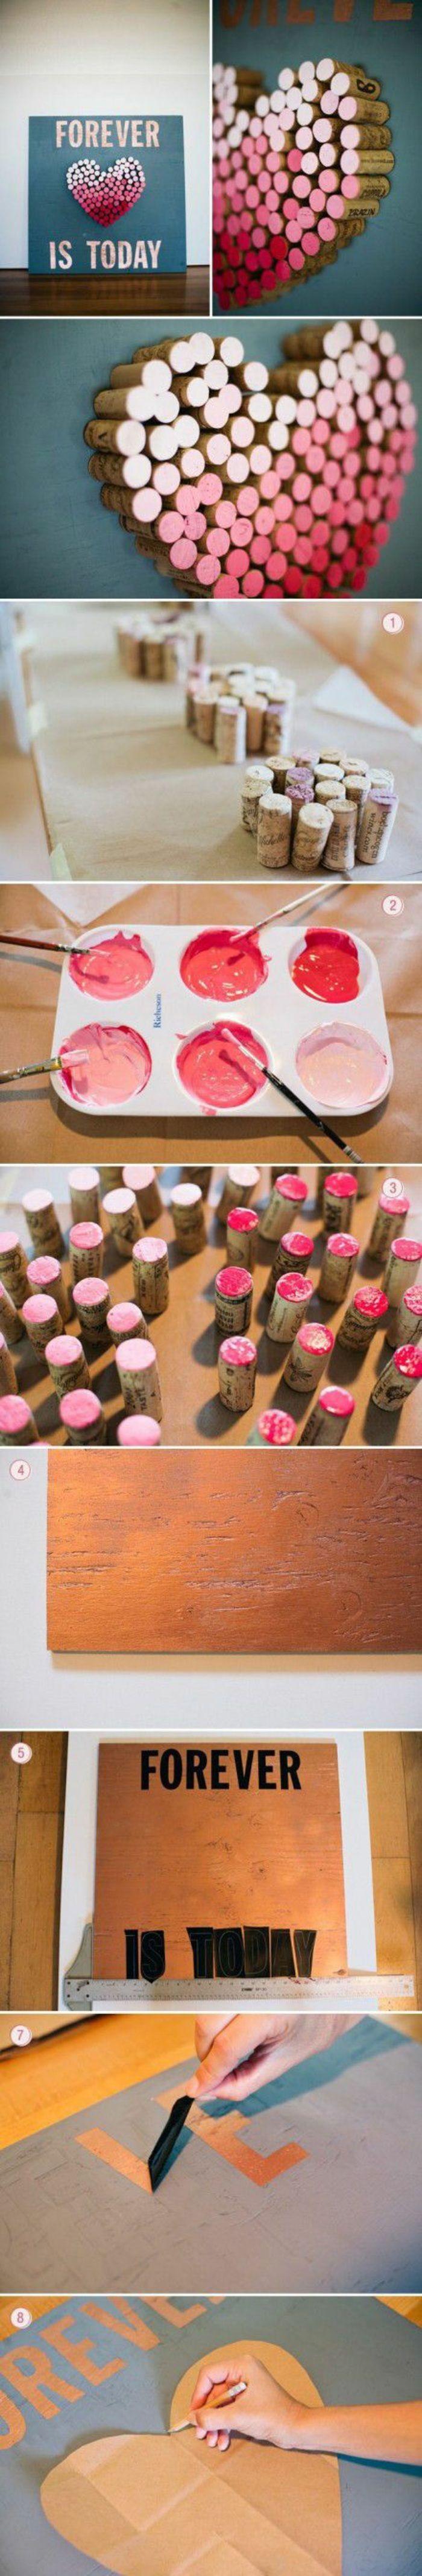 Die besten 25 wanddeko selber machen ideen auf pinterest for Ikea wanddeko